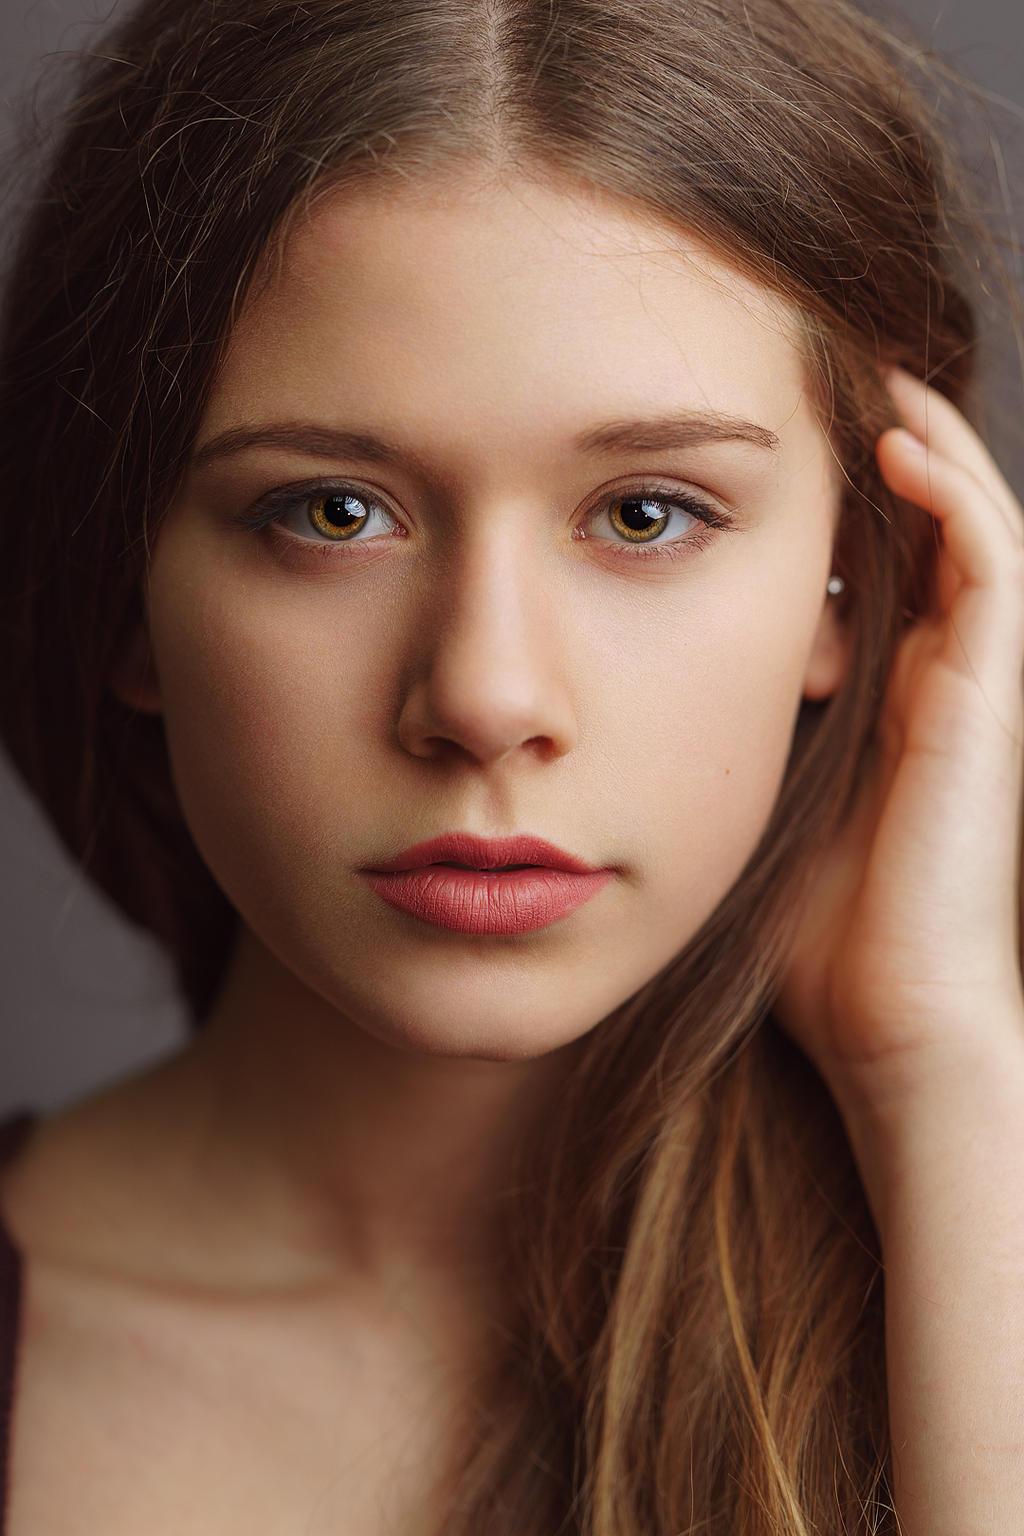 Emily XIX